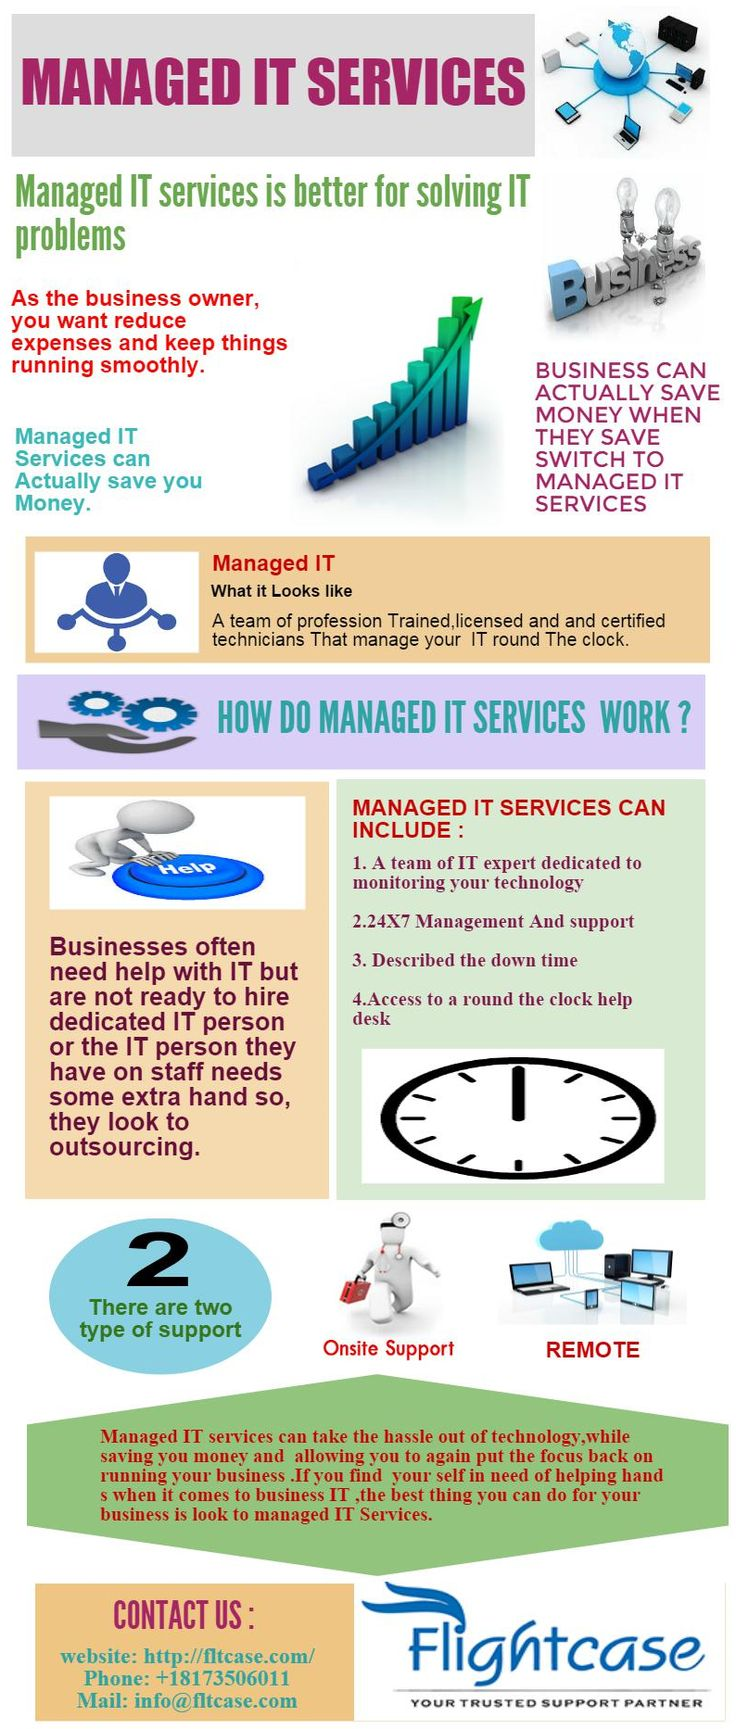 http://fltcase.com/IT-managed-services.php